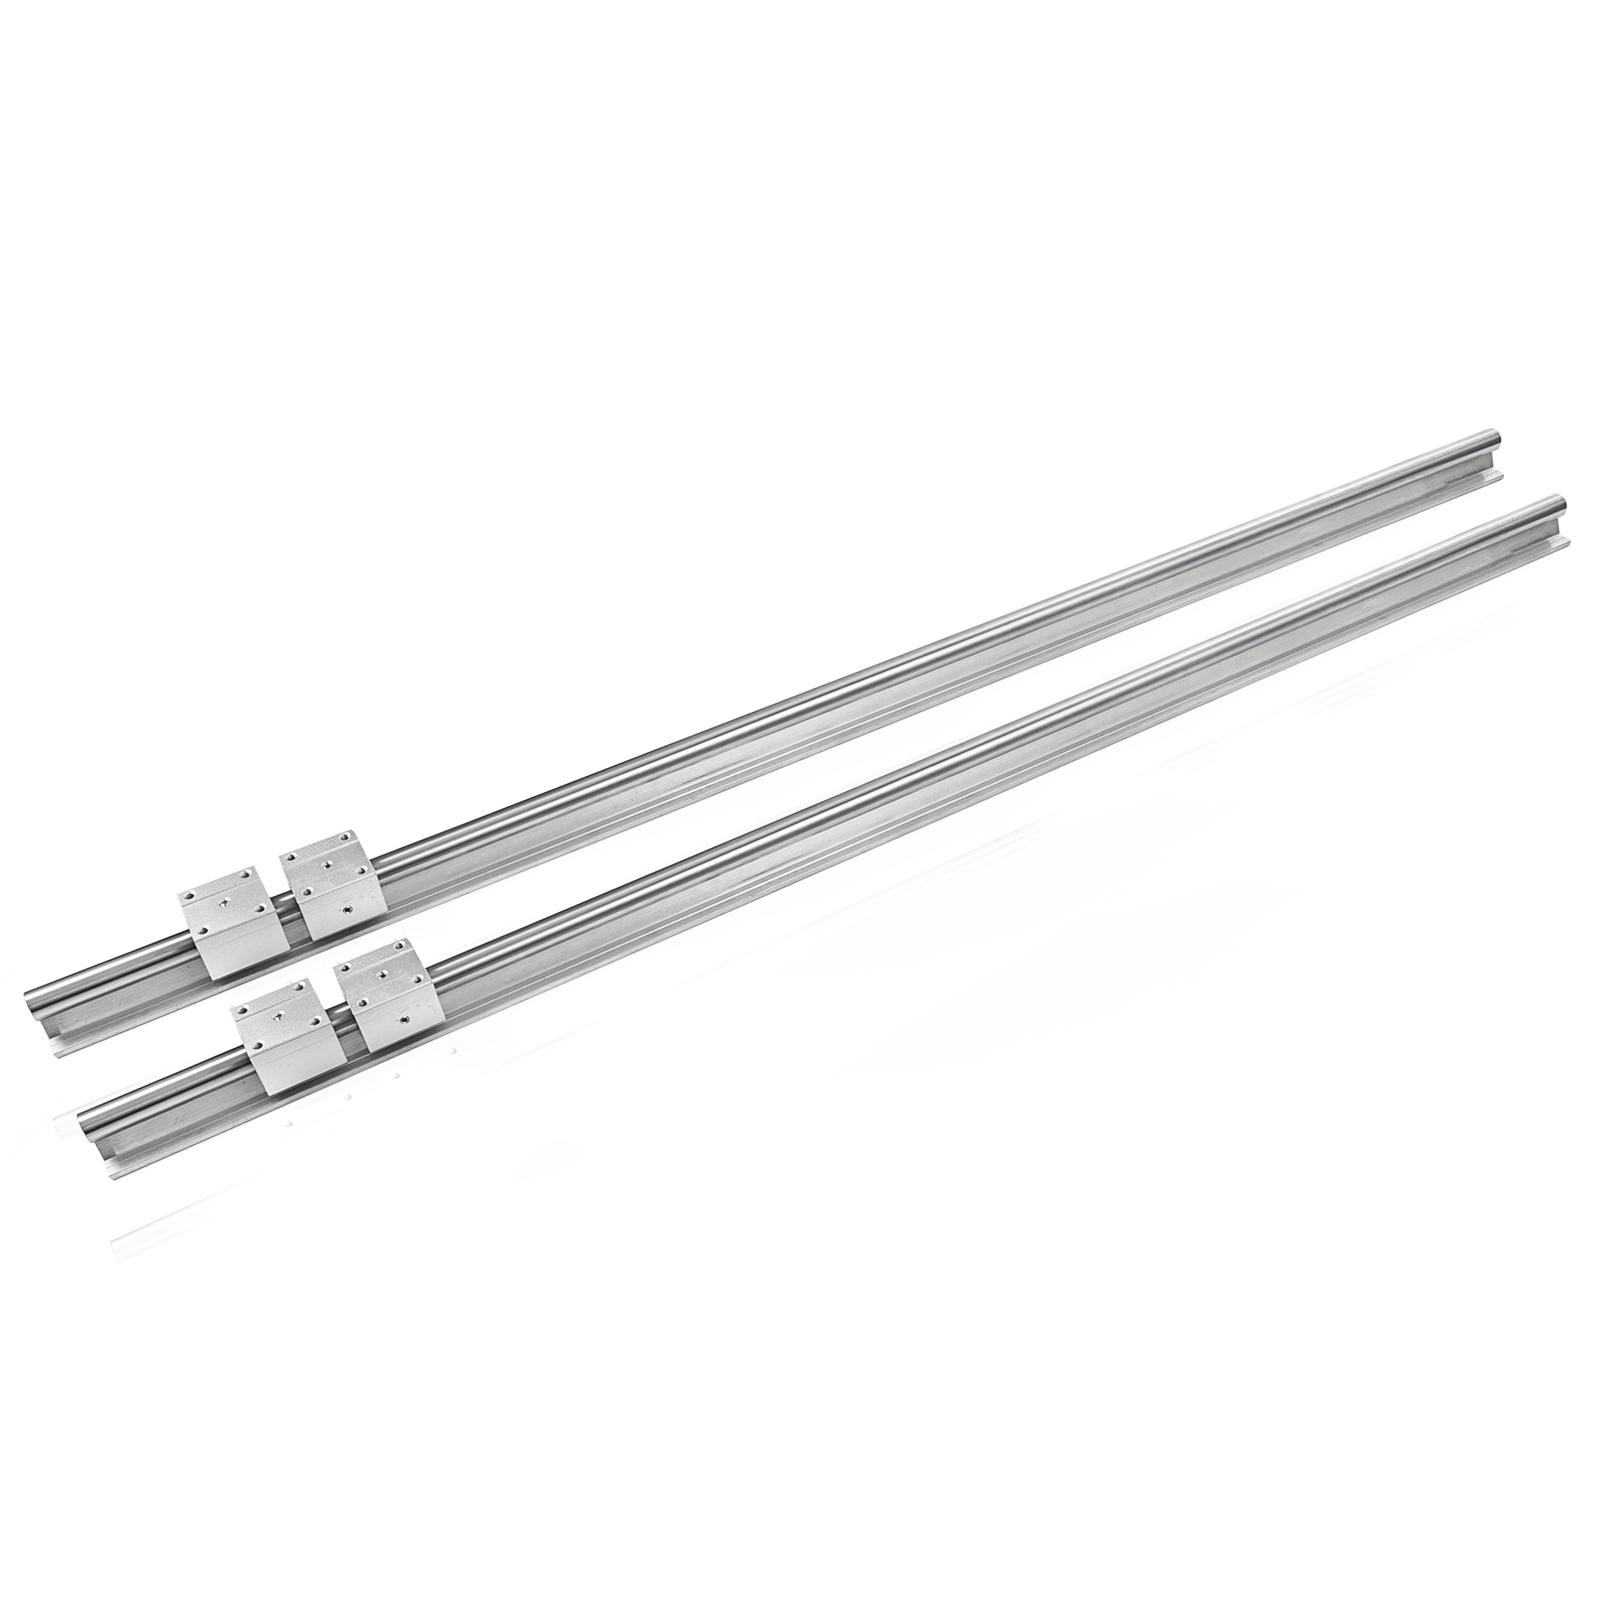 2Pcs-SBR20-1200mm-Linear-Slide-Guide-Shaft-Rail-4Pcs-SBR20UU-Bearing-Block-CNC thumbnail 4